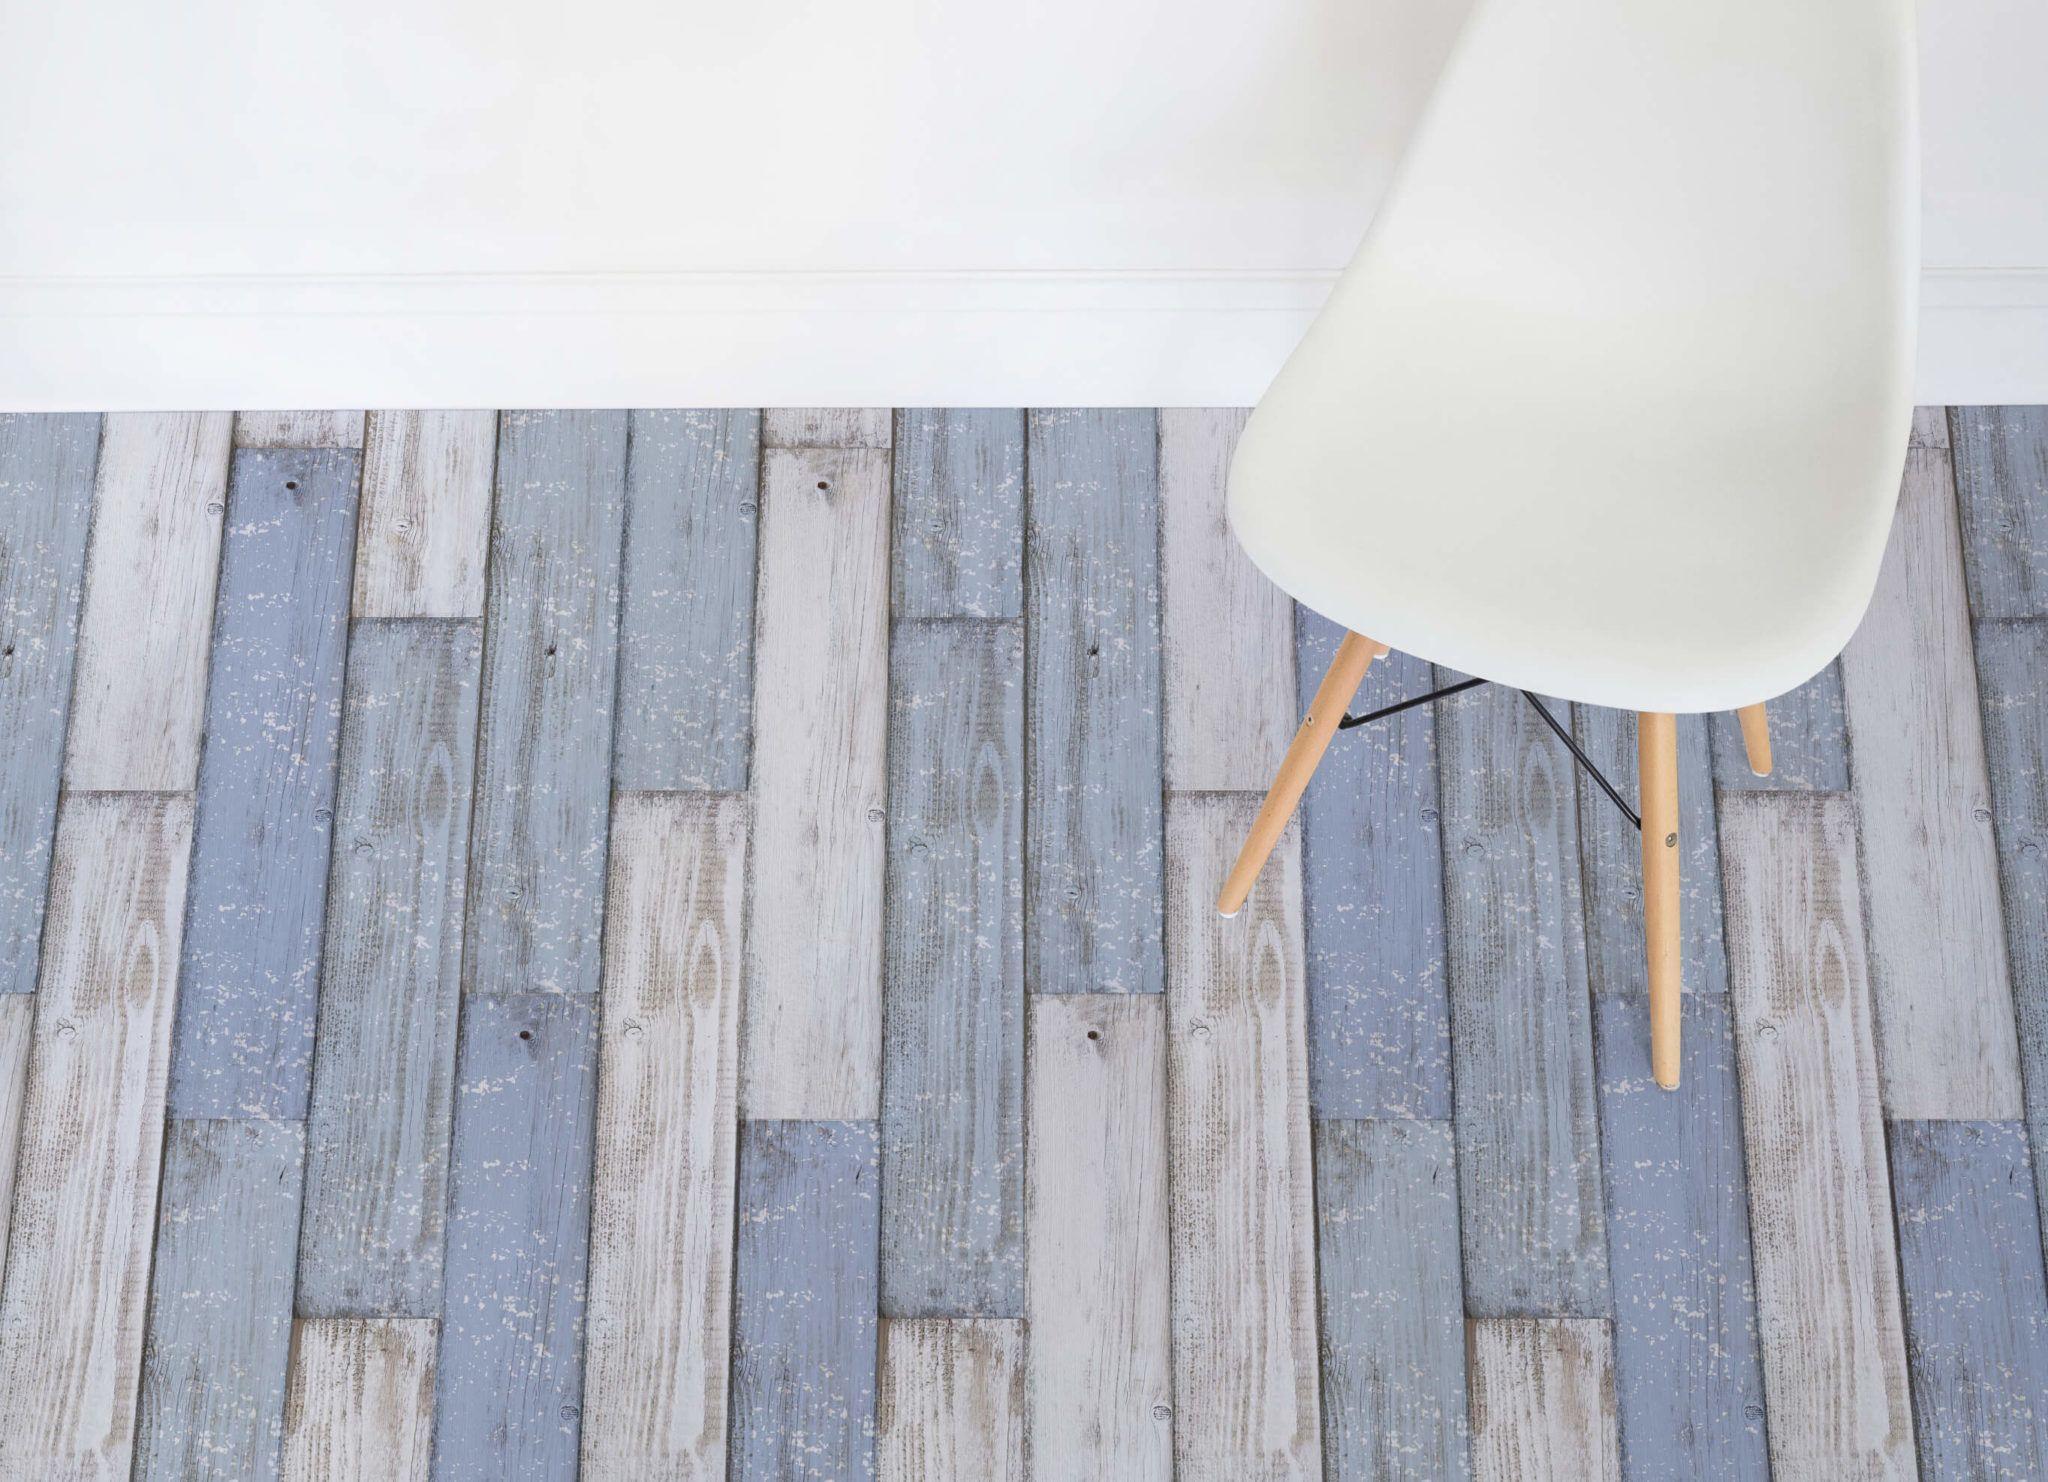 Clubhouse Staining Wood Floors Wood Plank Texture Vinyl Flooring